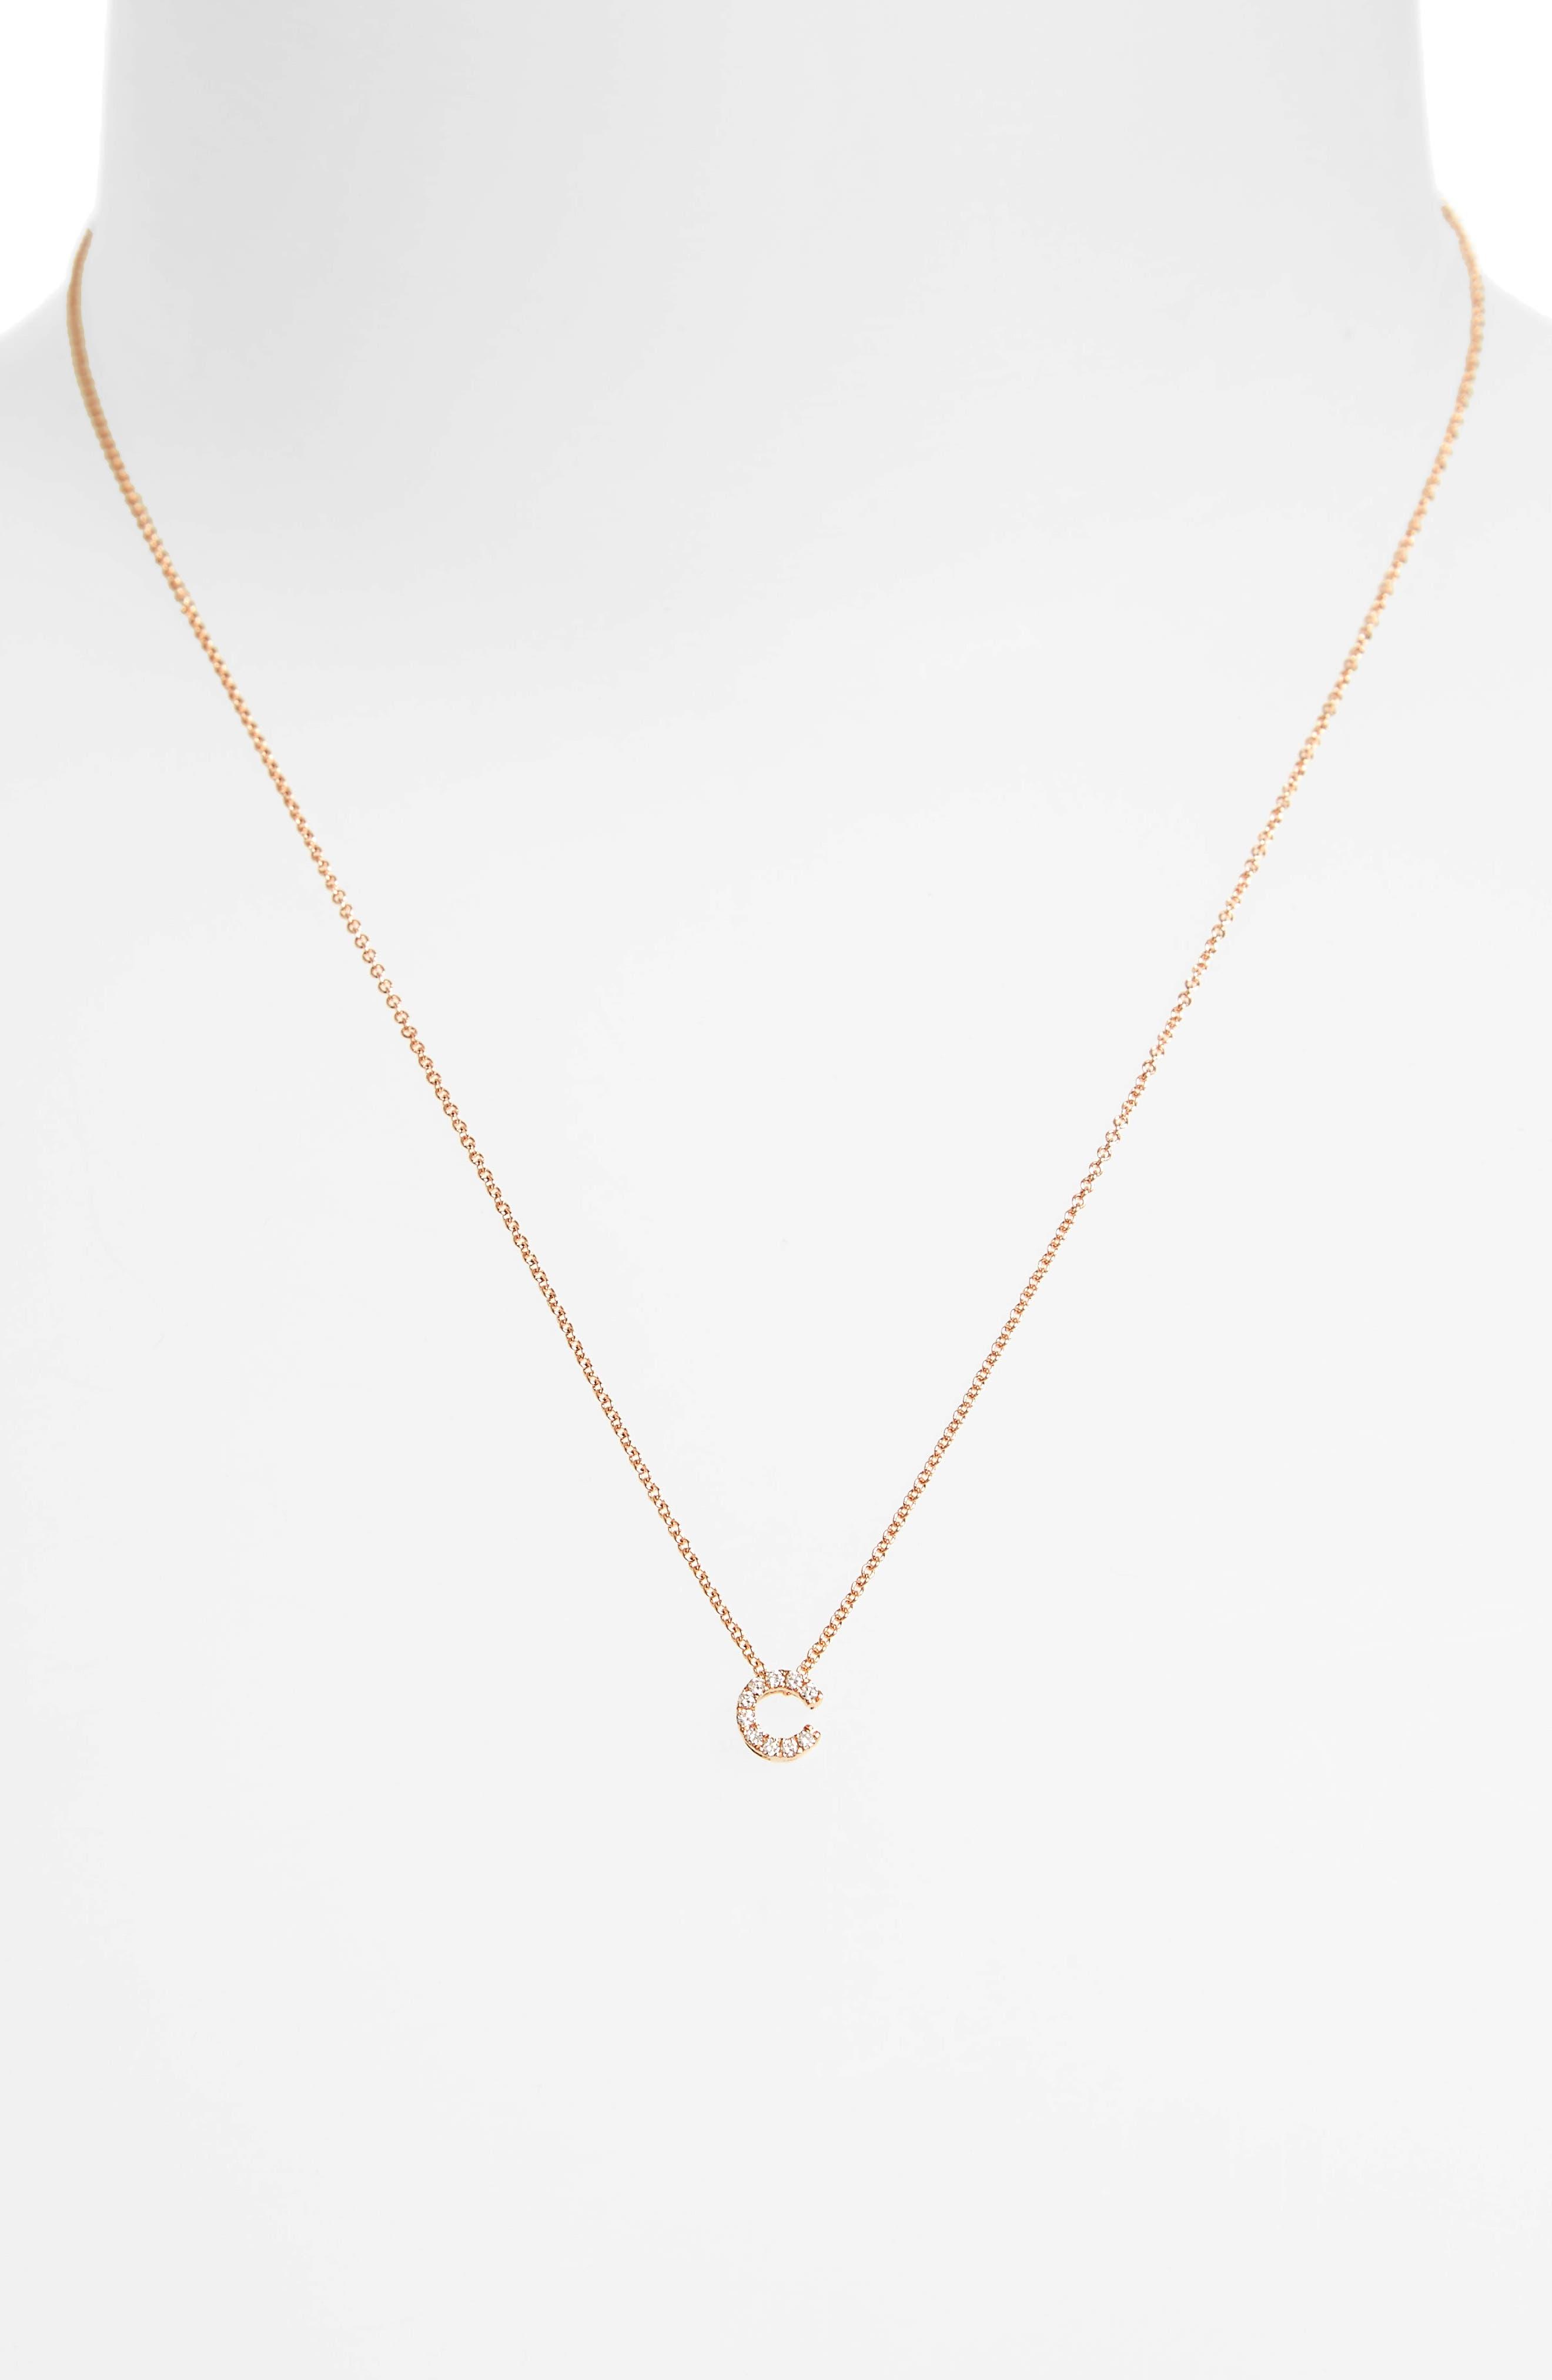 18k Gold Pavé Diamond Initial Pendant Necklace,                             Alternate thumbnail 2, color,                             ROSE GOLD - C